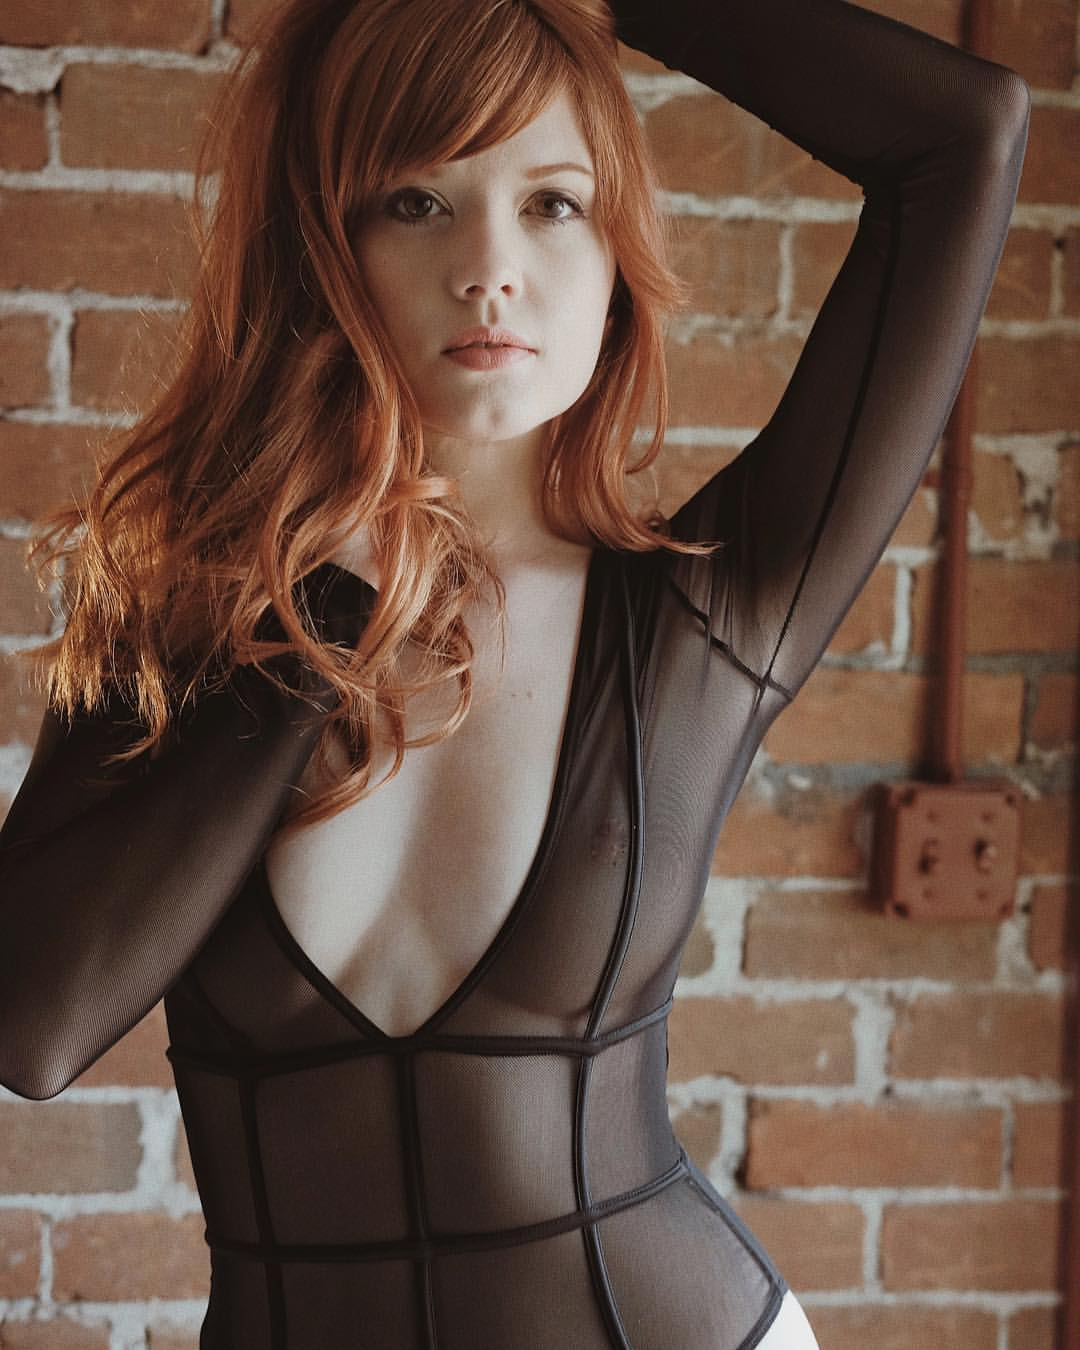 Amber Rose Film Porno amber rose mcconnell porn pic - eporner